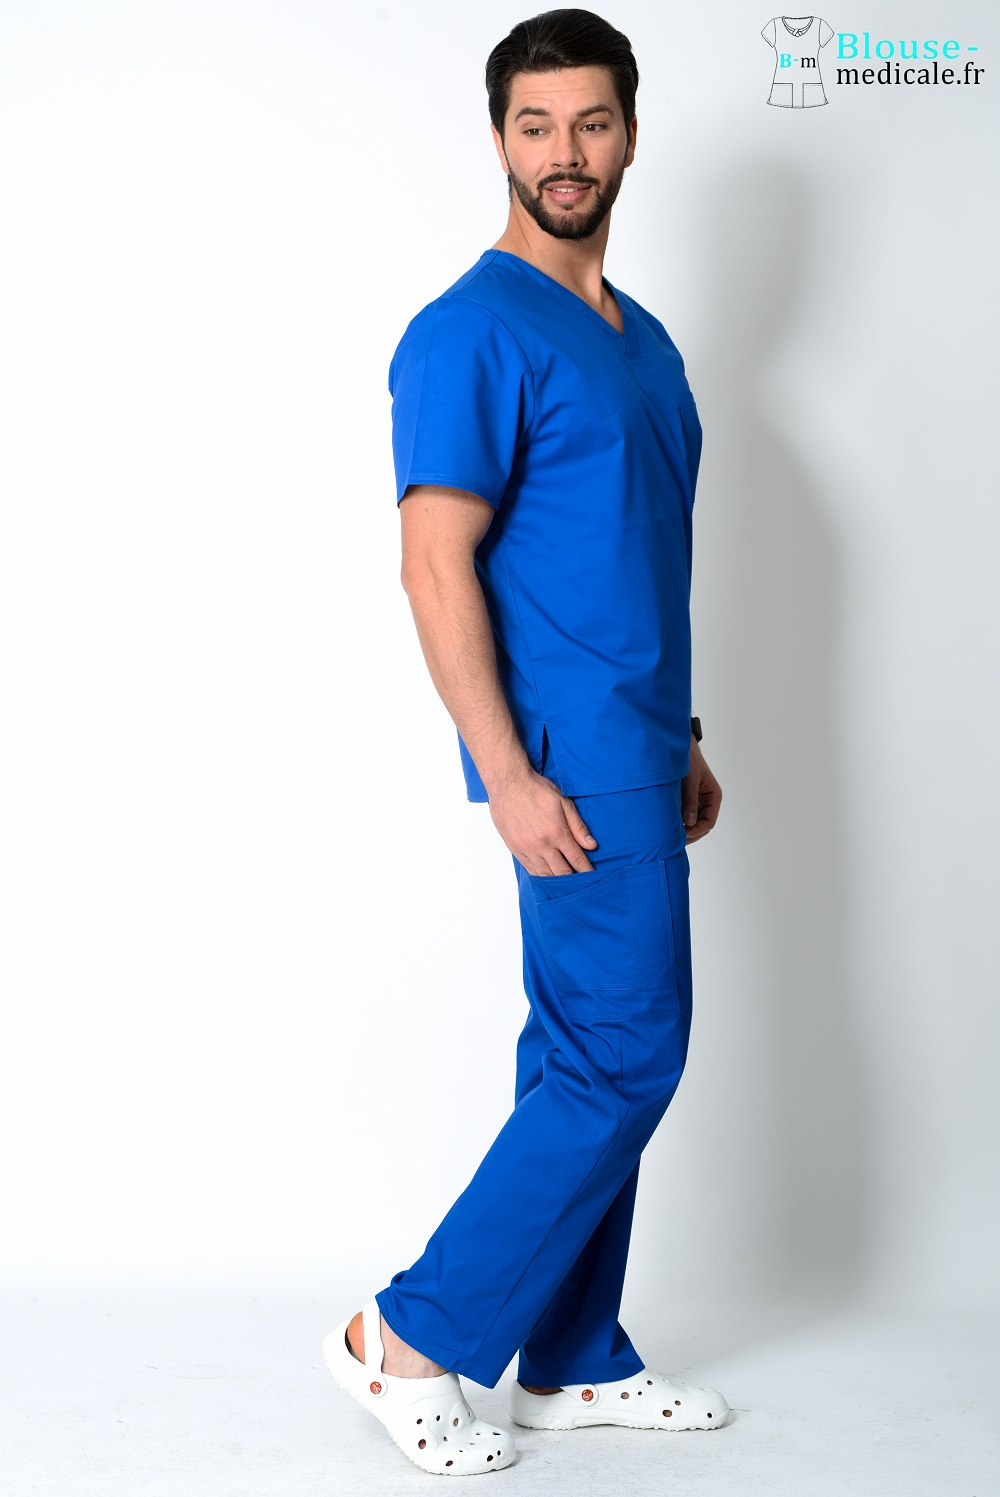 tenue médicale homme couleur cherokee tenue chirurgien homme luxe